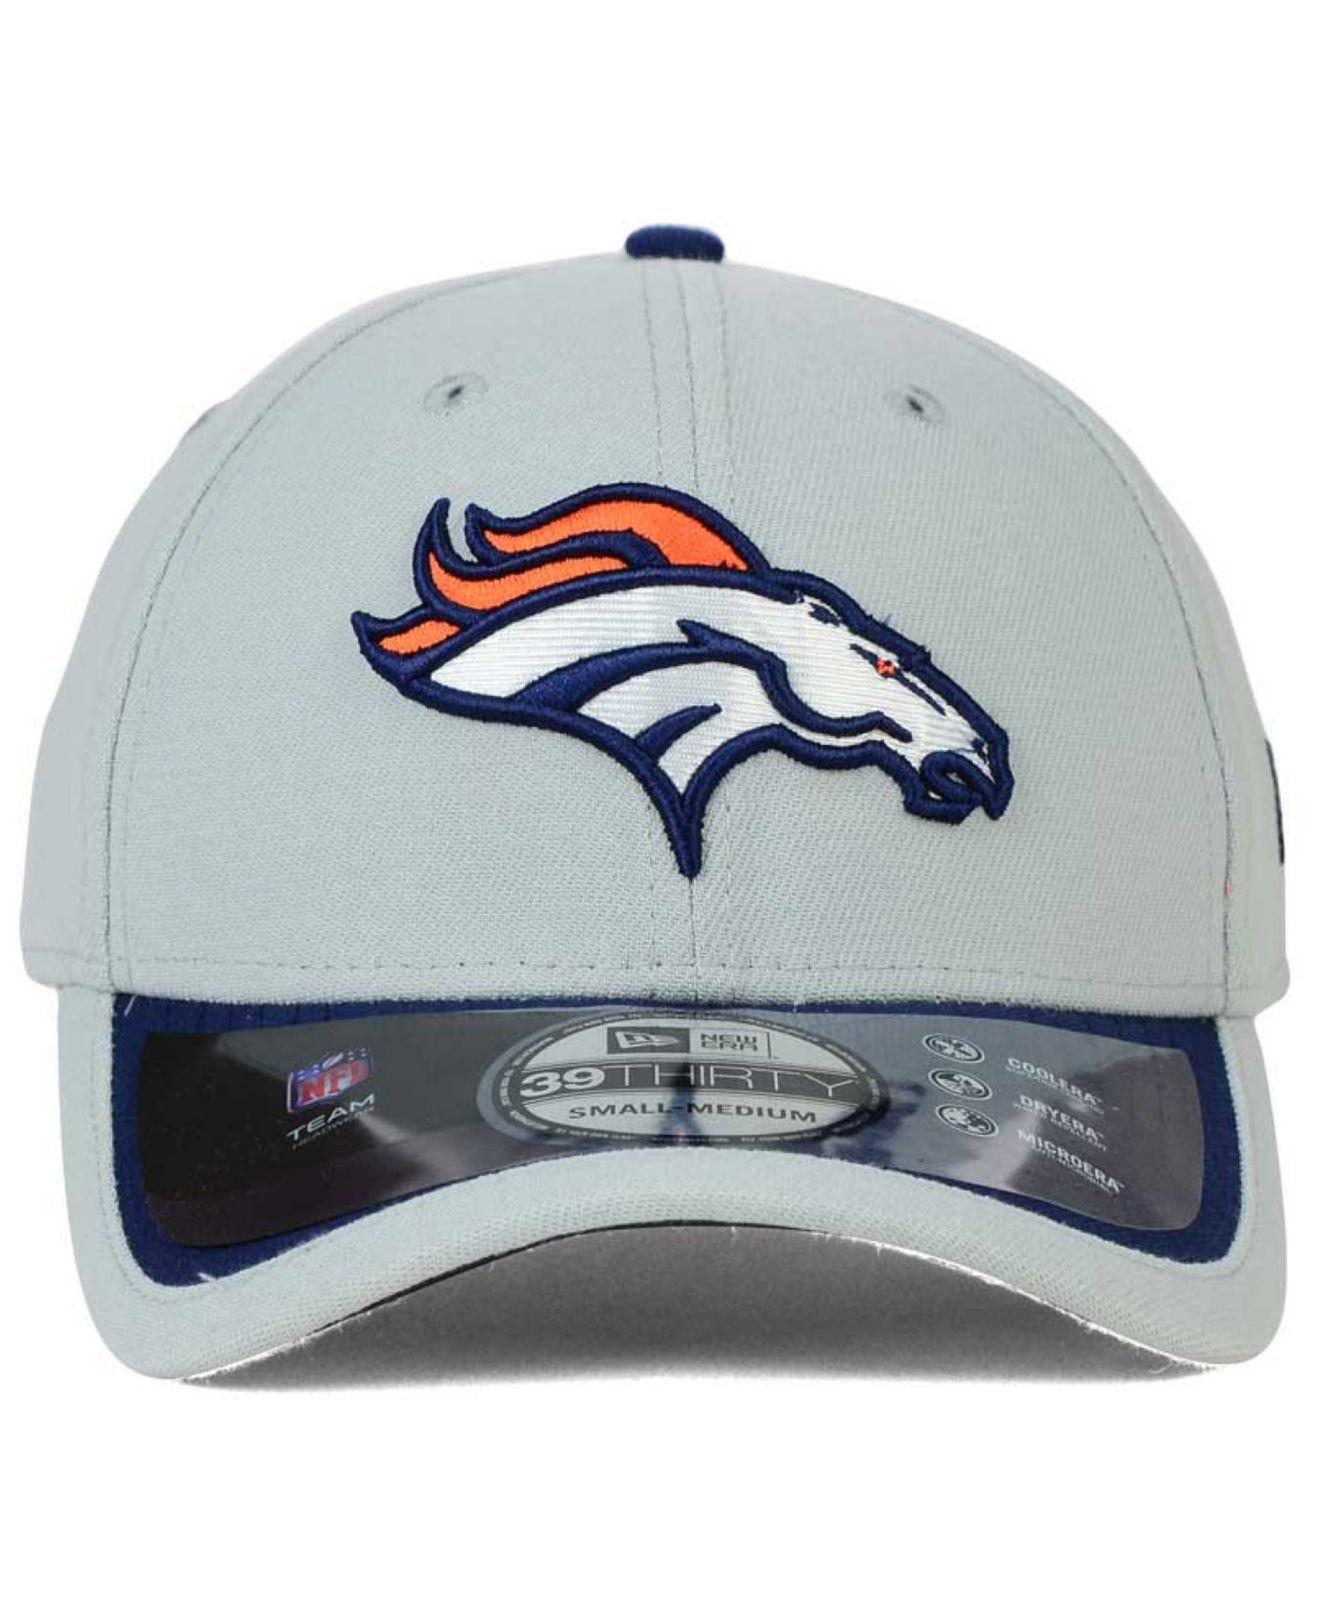 5cf1c323 shop denver broncos grey hat dd20f 6963d